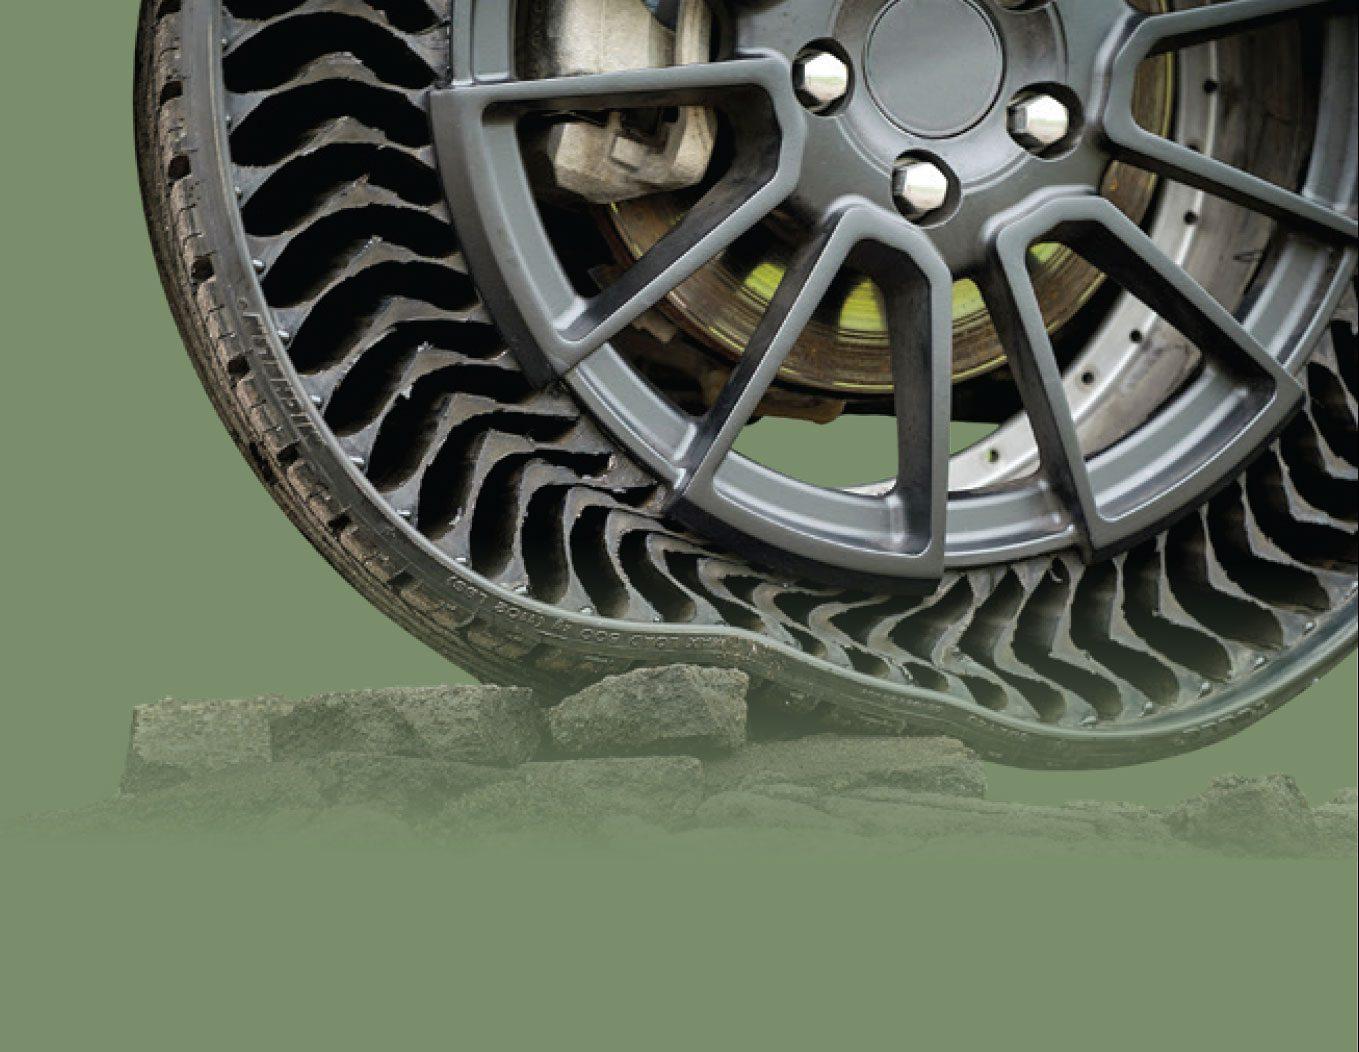 A tire revolution